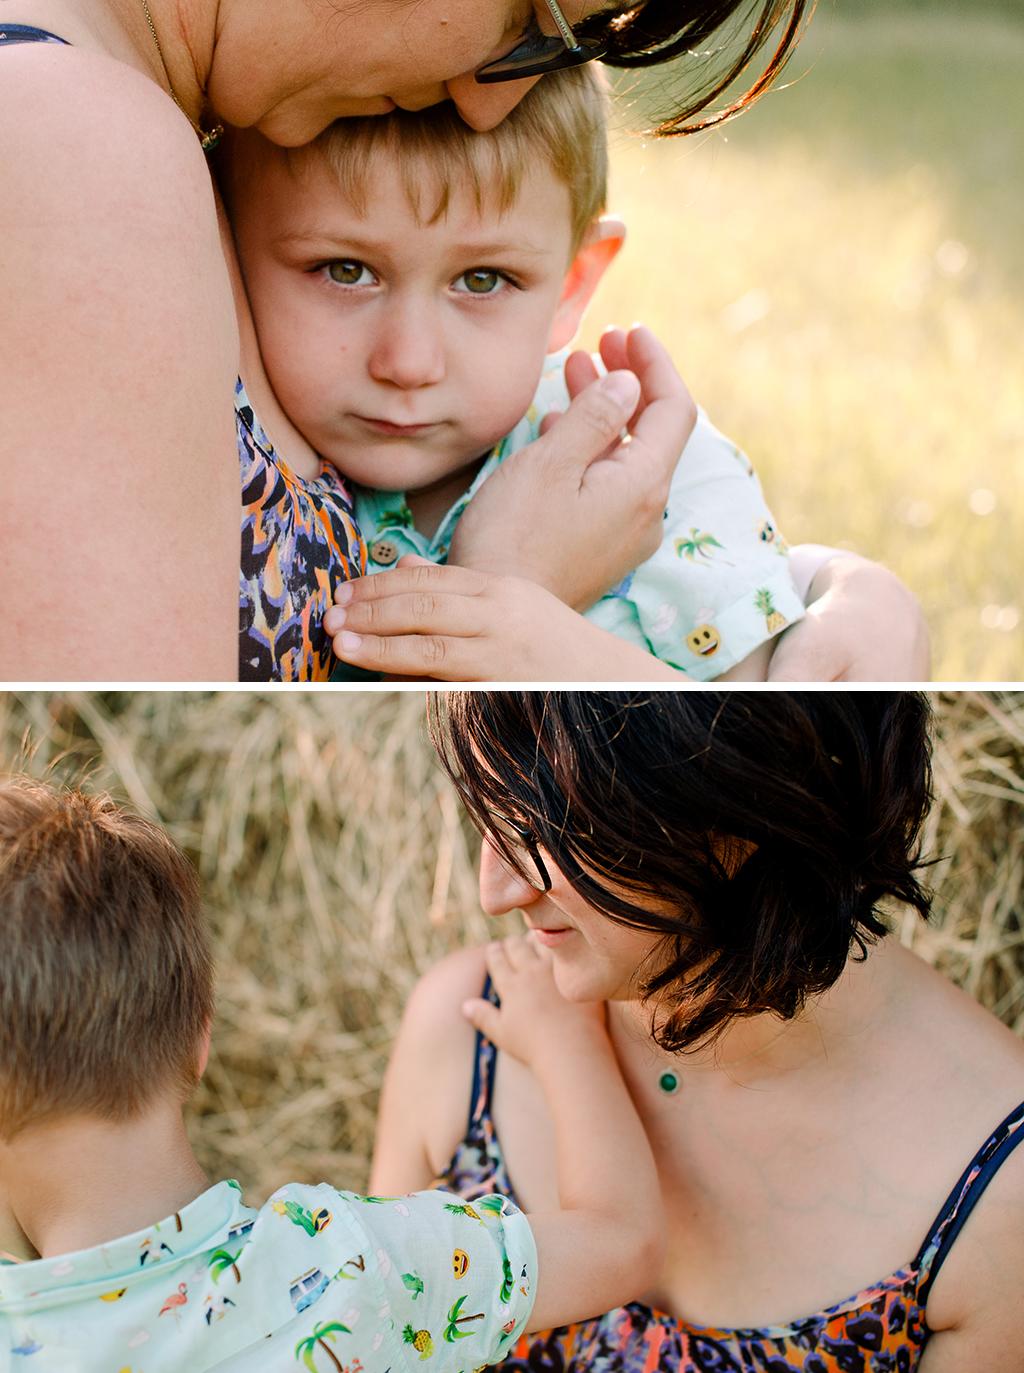 Sommar-familjefotografering_Stockholm_Anna_Sandstrom_13.jpg